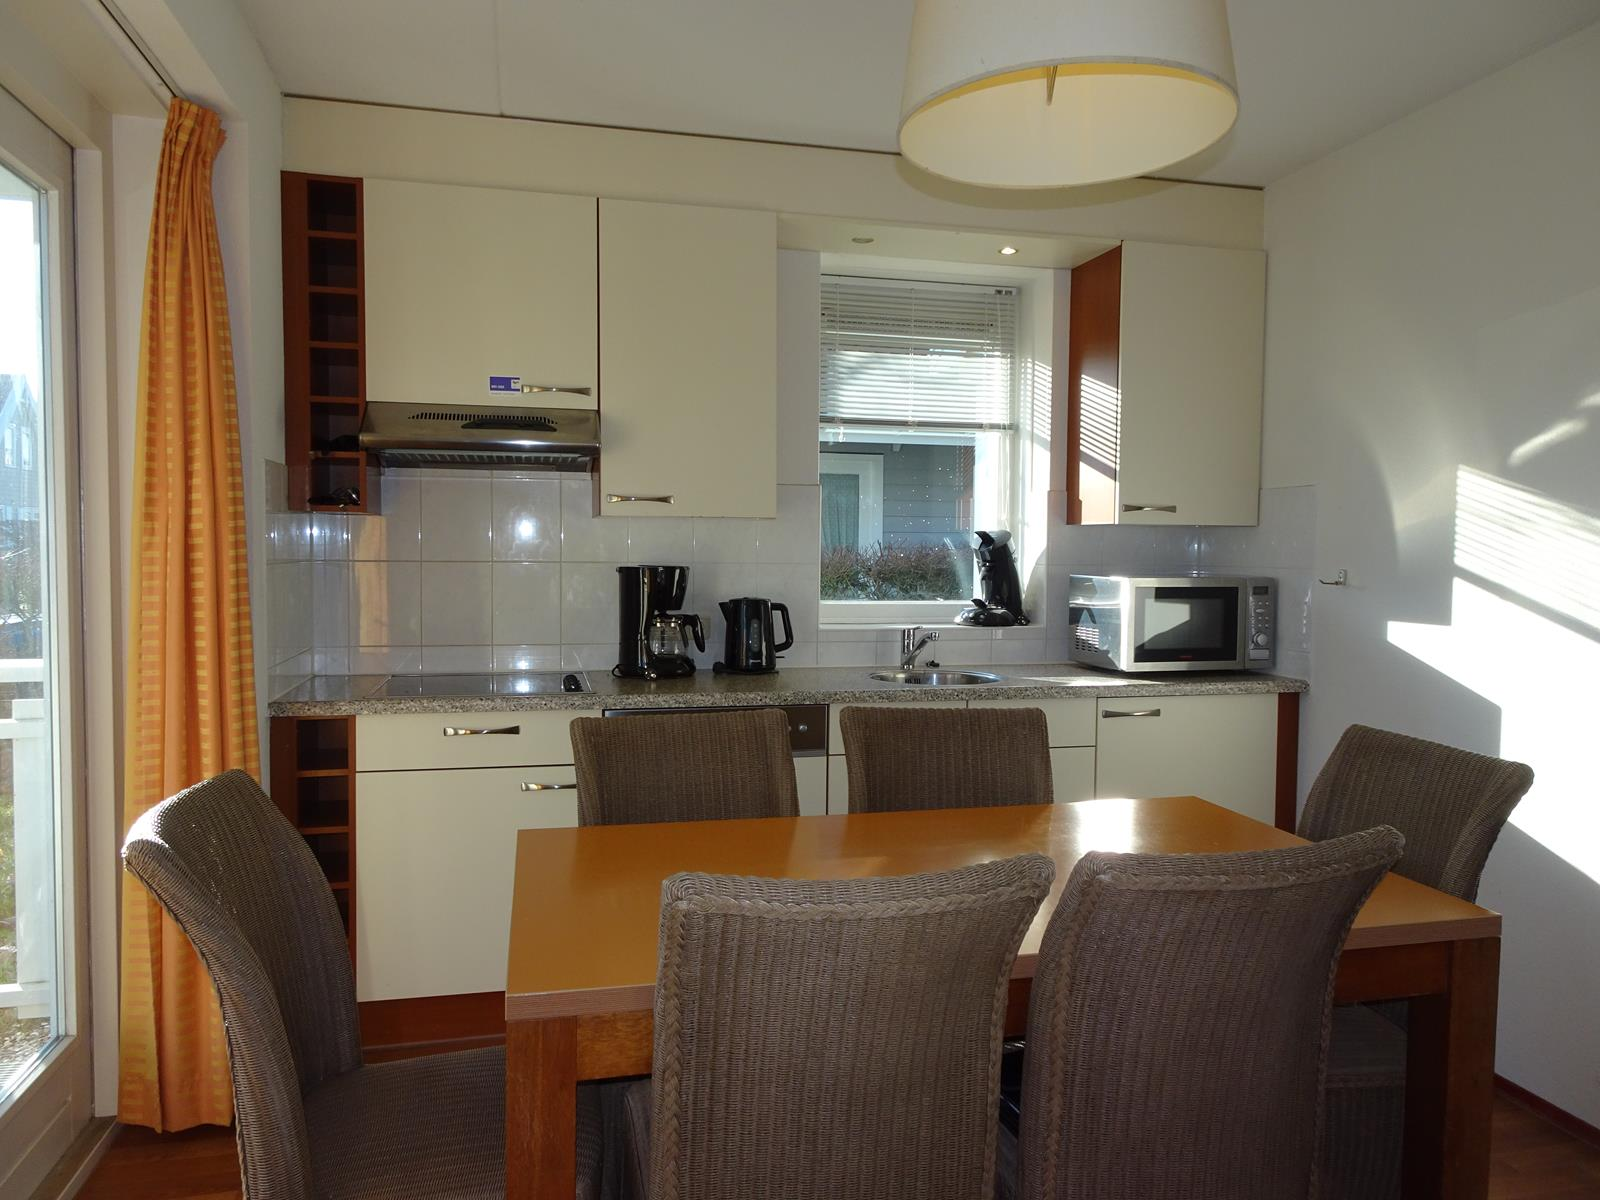 Vakantiehuis te koop Zeeland Bruinisse K155 (9).jpg